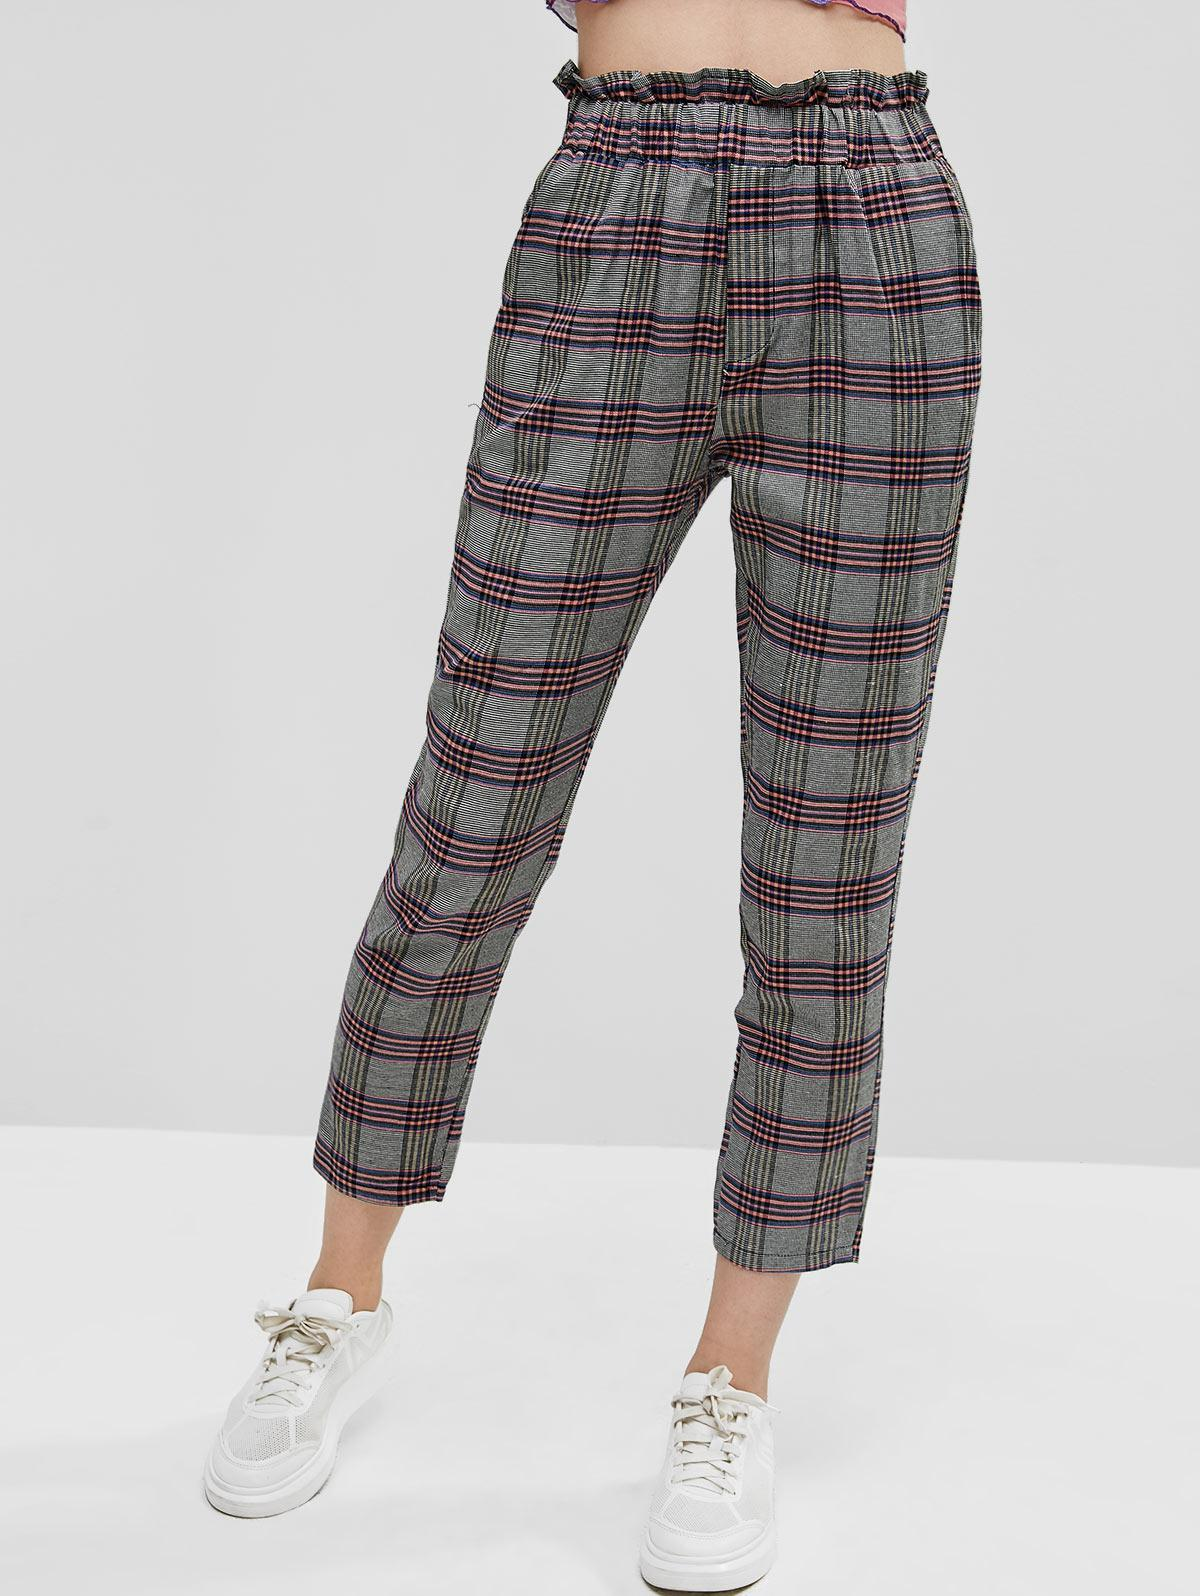 High Waisted Pockets Plaid Paperbag Pants, Multi-a